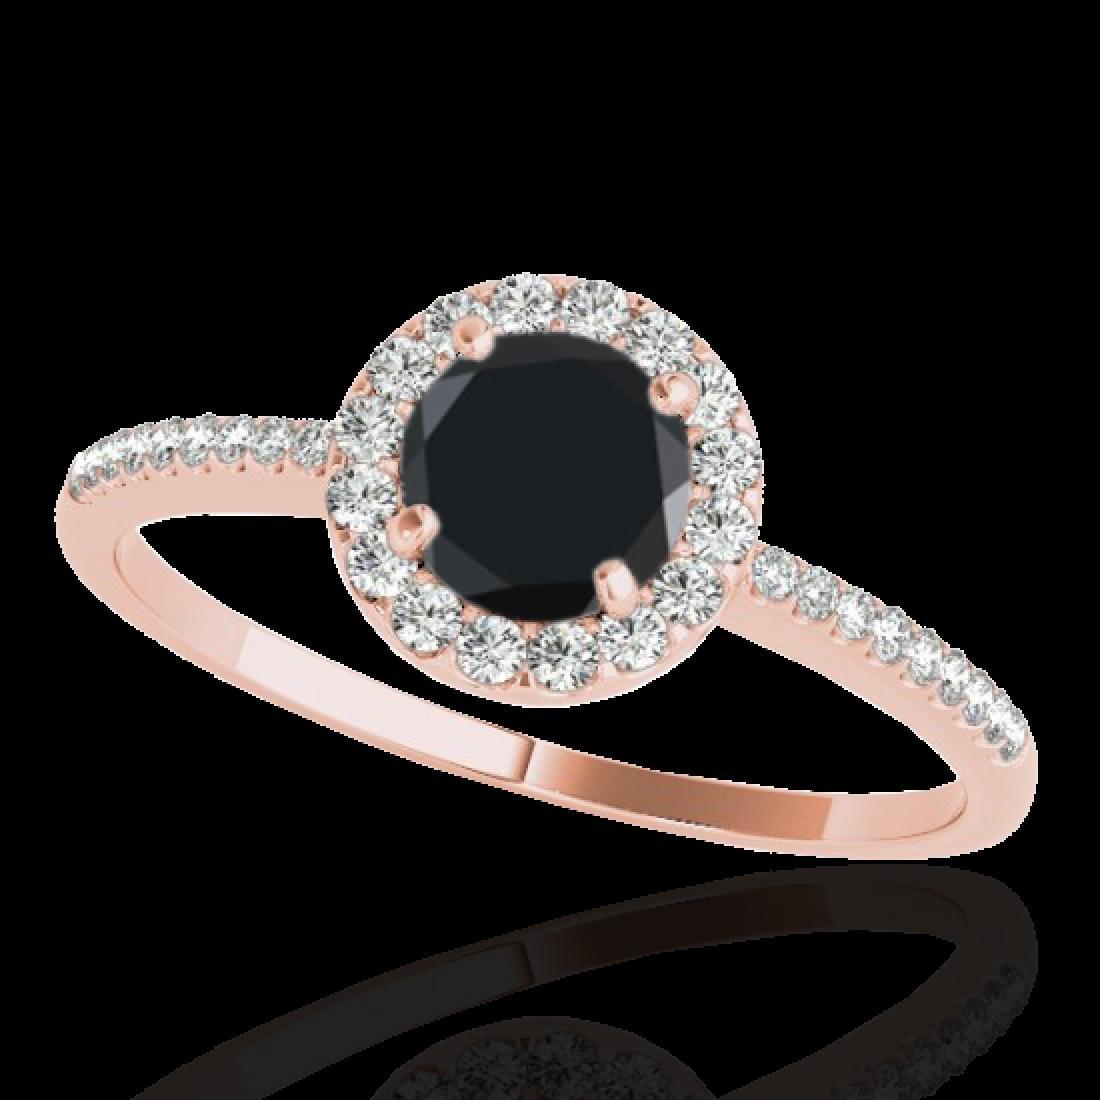 1.2 CTW Certified VS Black Diamond Solitaire Halo Ring